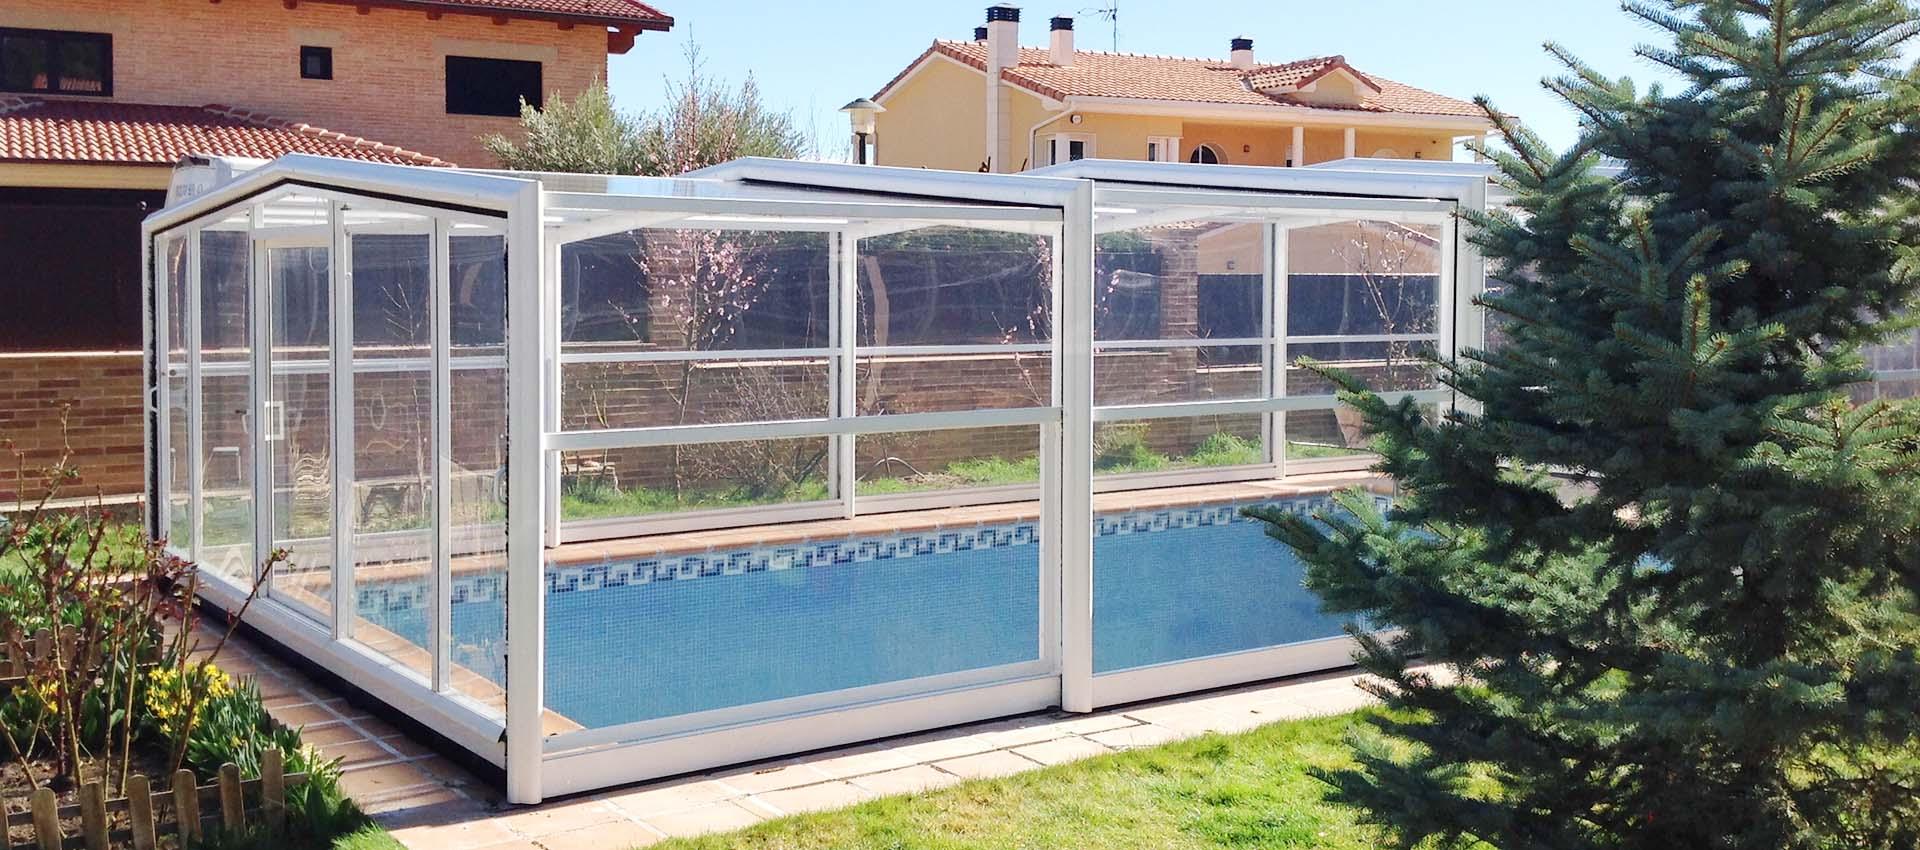 Cubierta alta telesc pica sin carriles para piscinas for Cubierta piscina desmontable